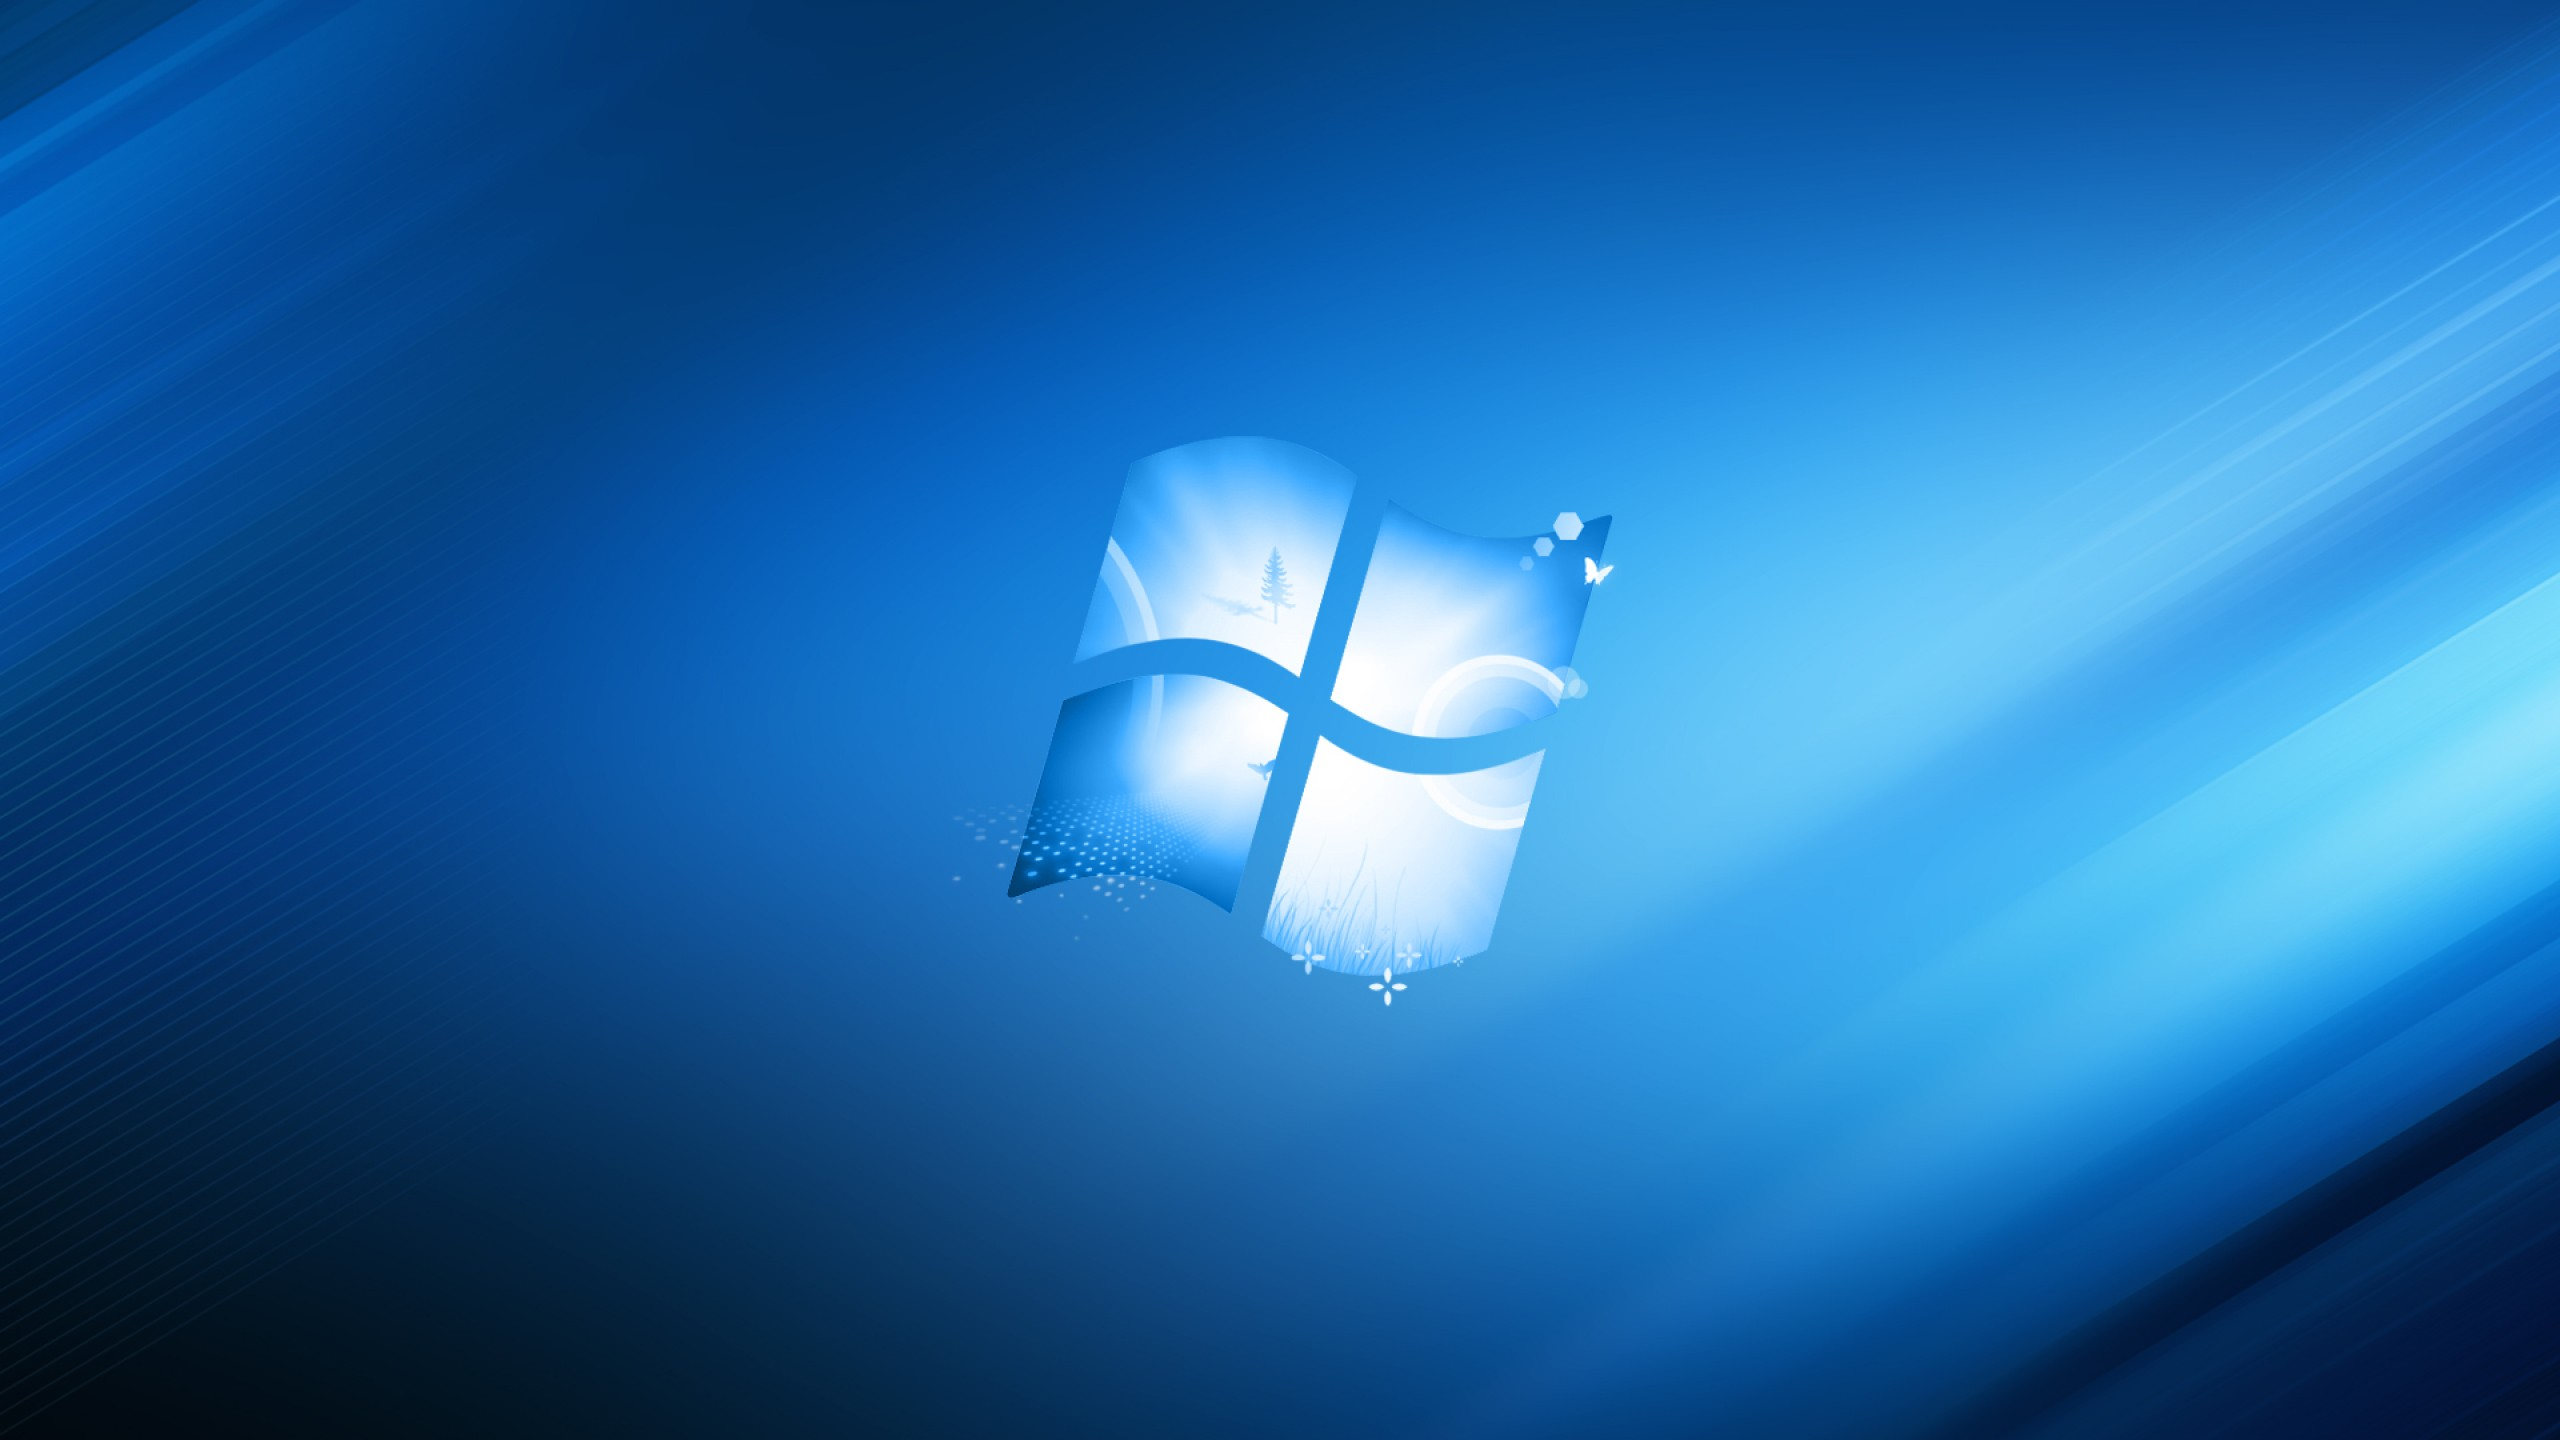 Cool windows 10 blue wallpaper 2560x1440   Wallpaper   Wallpaper Style 2560x1440